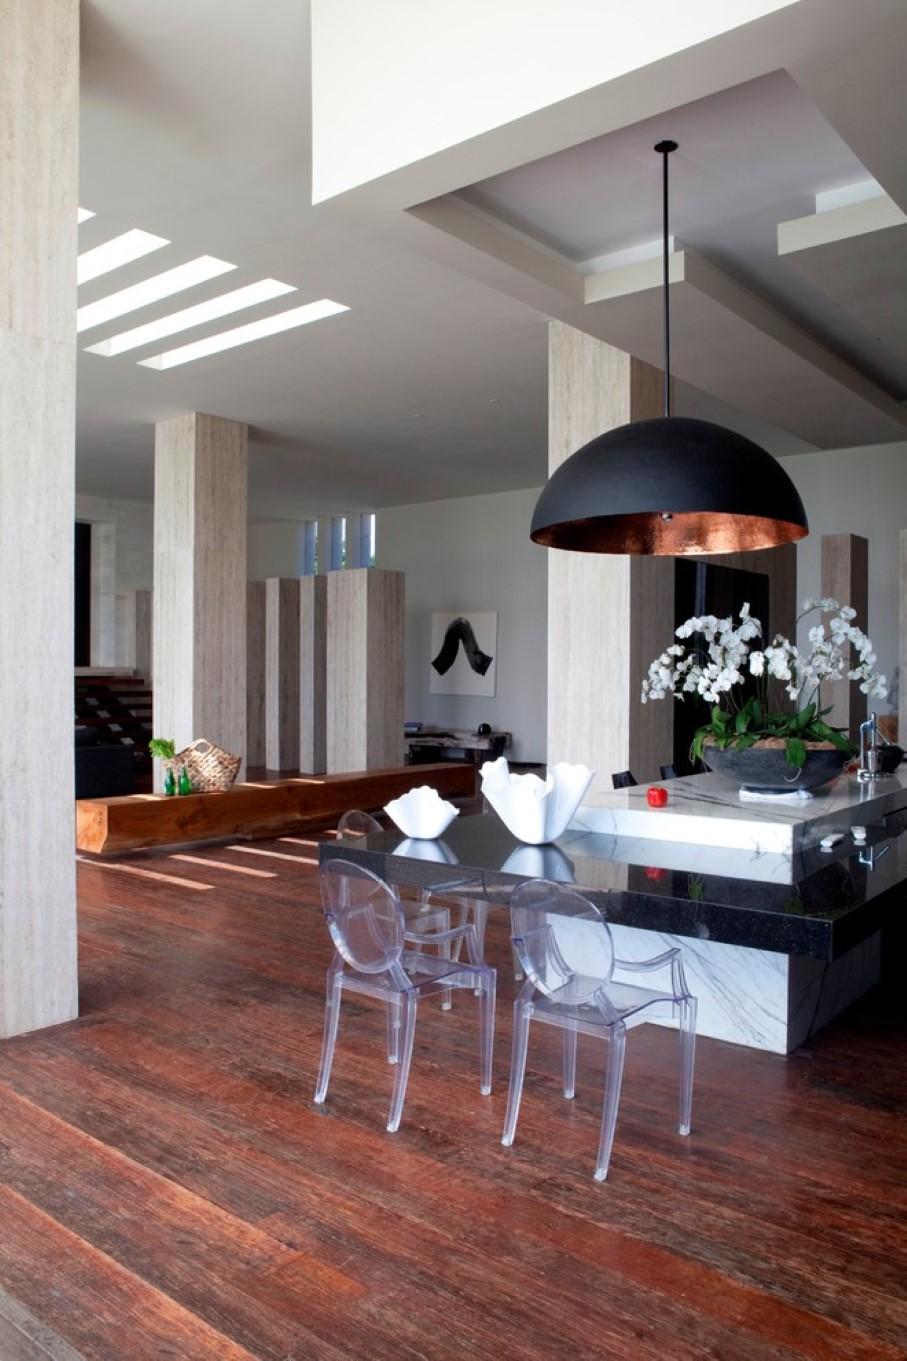 trendy copper pendant light kitchen lights over table Oversized lamp over the kitchen island